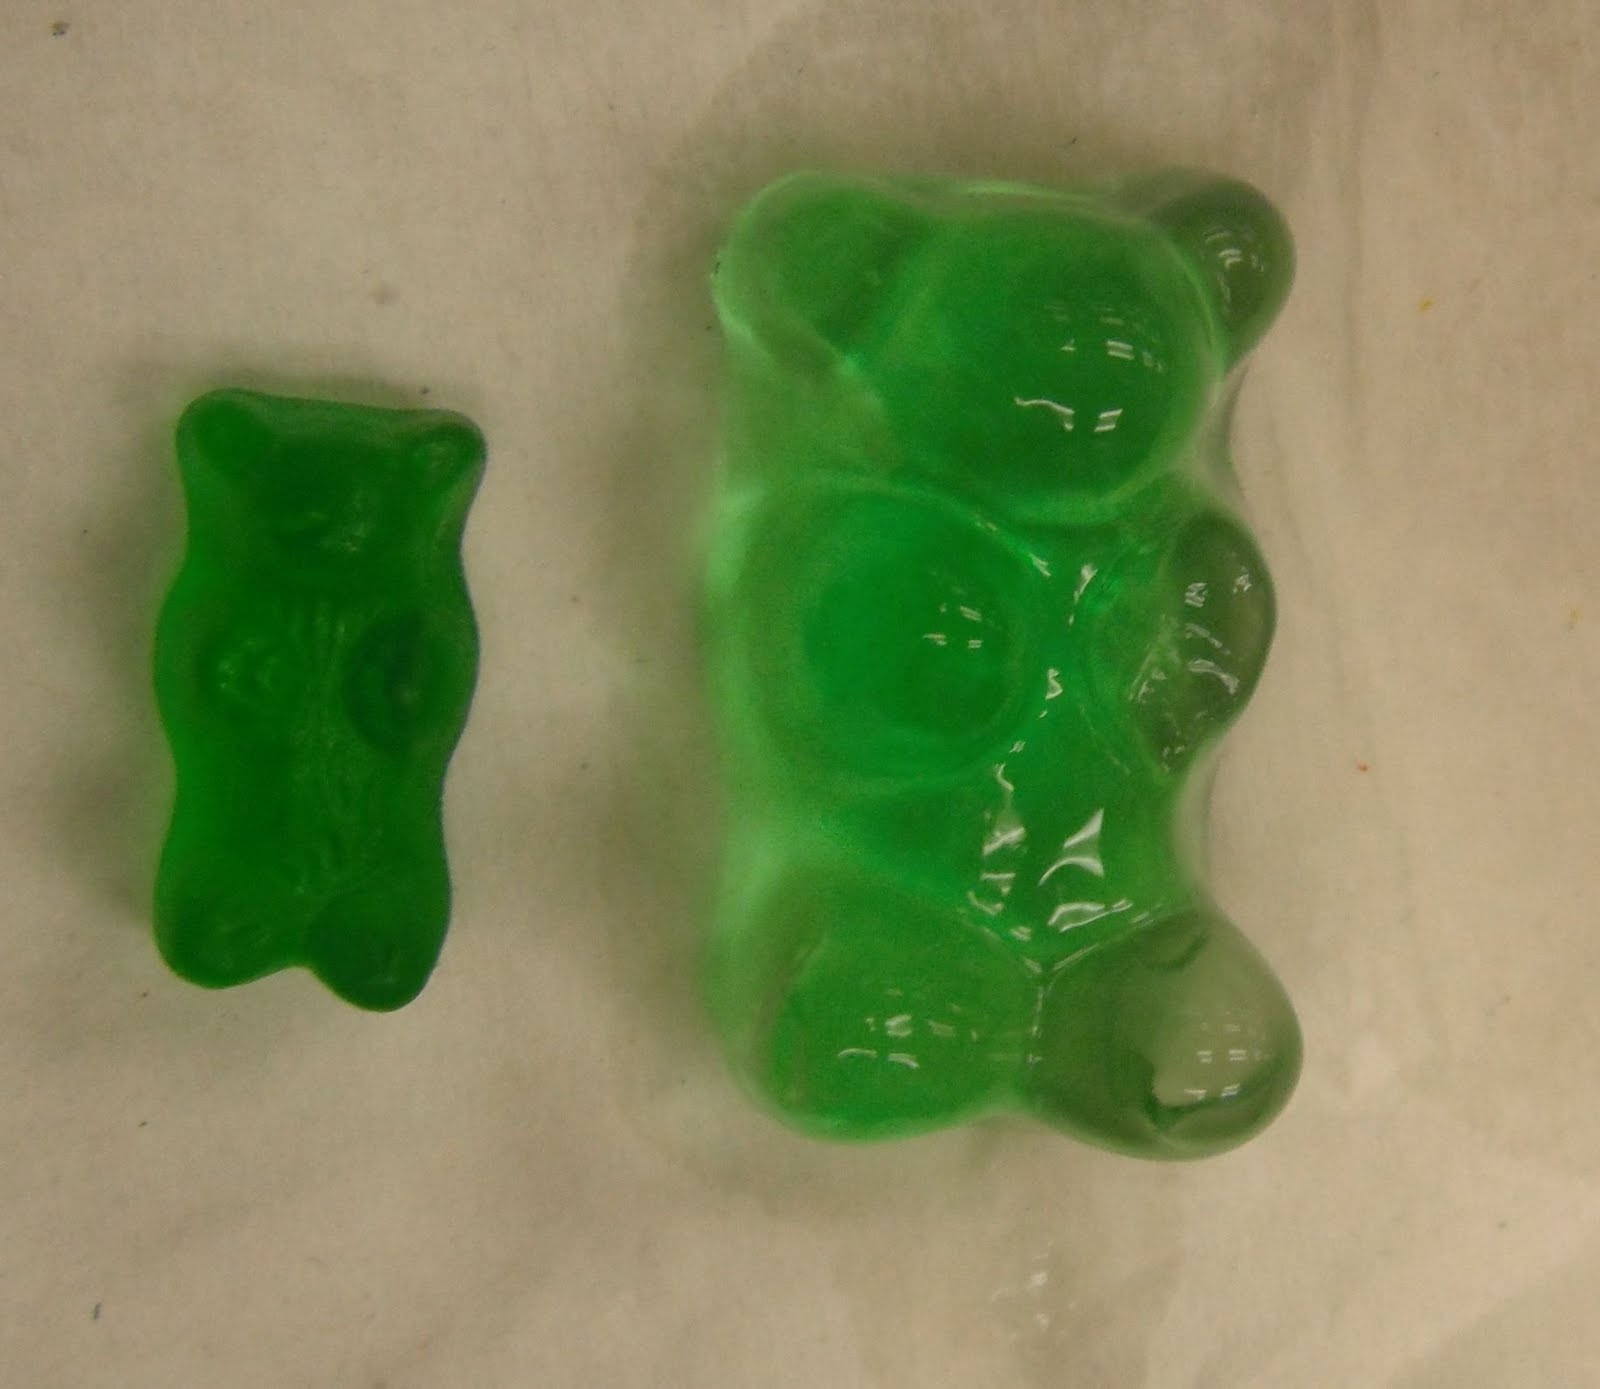 Ms J S Chemistry Class Recap Of Gummy Bears Experiment